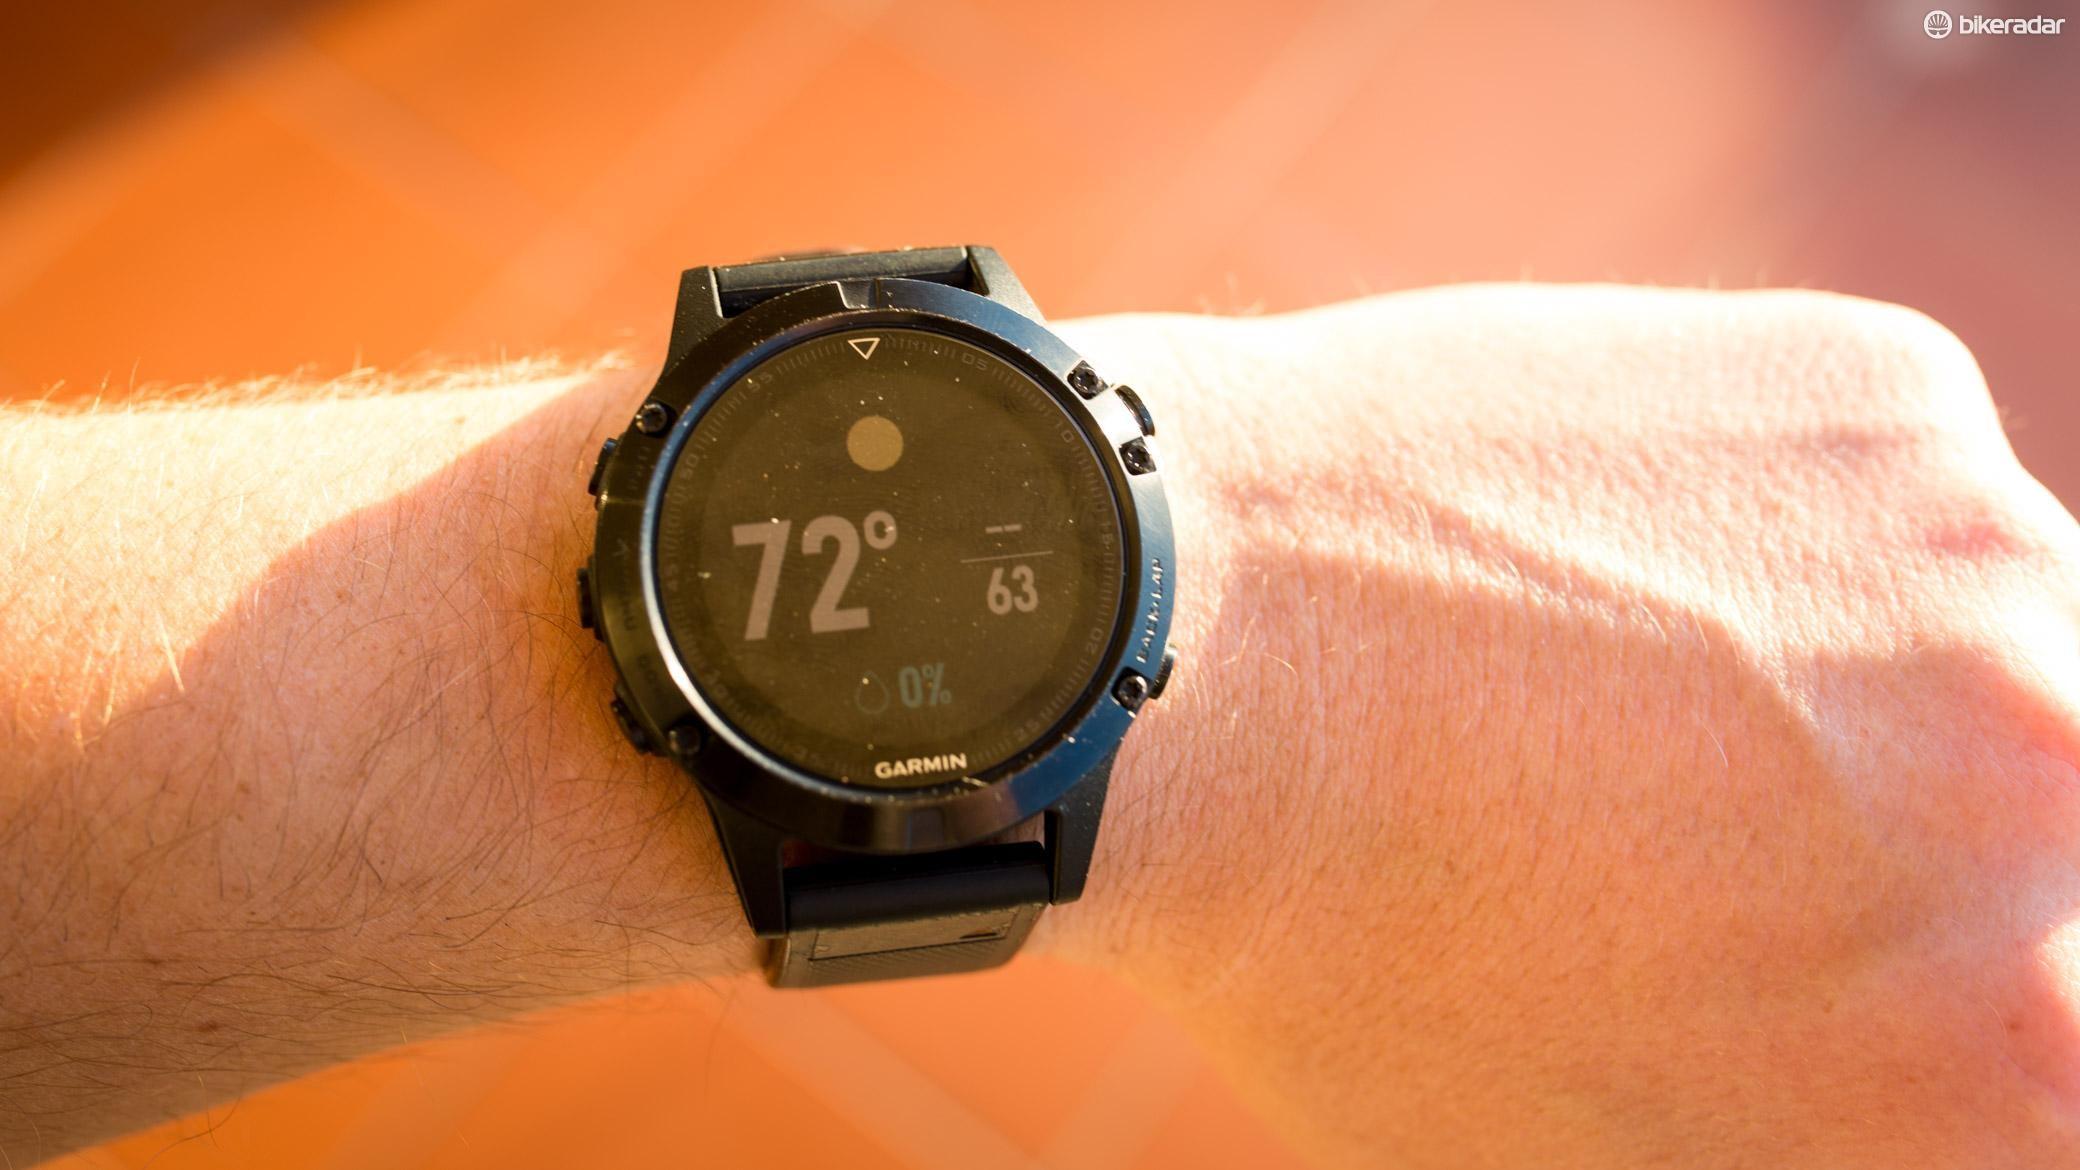 garmin fenix 5 gps watch review gadgets training